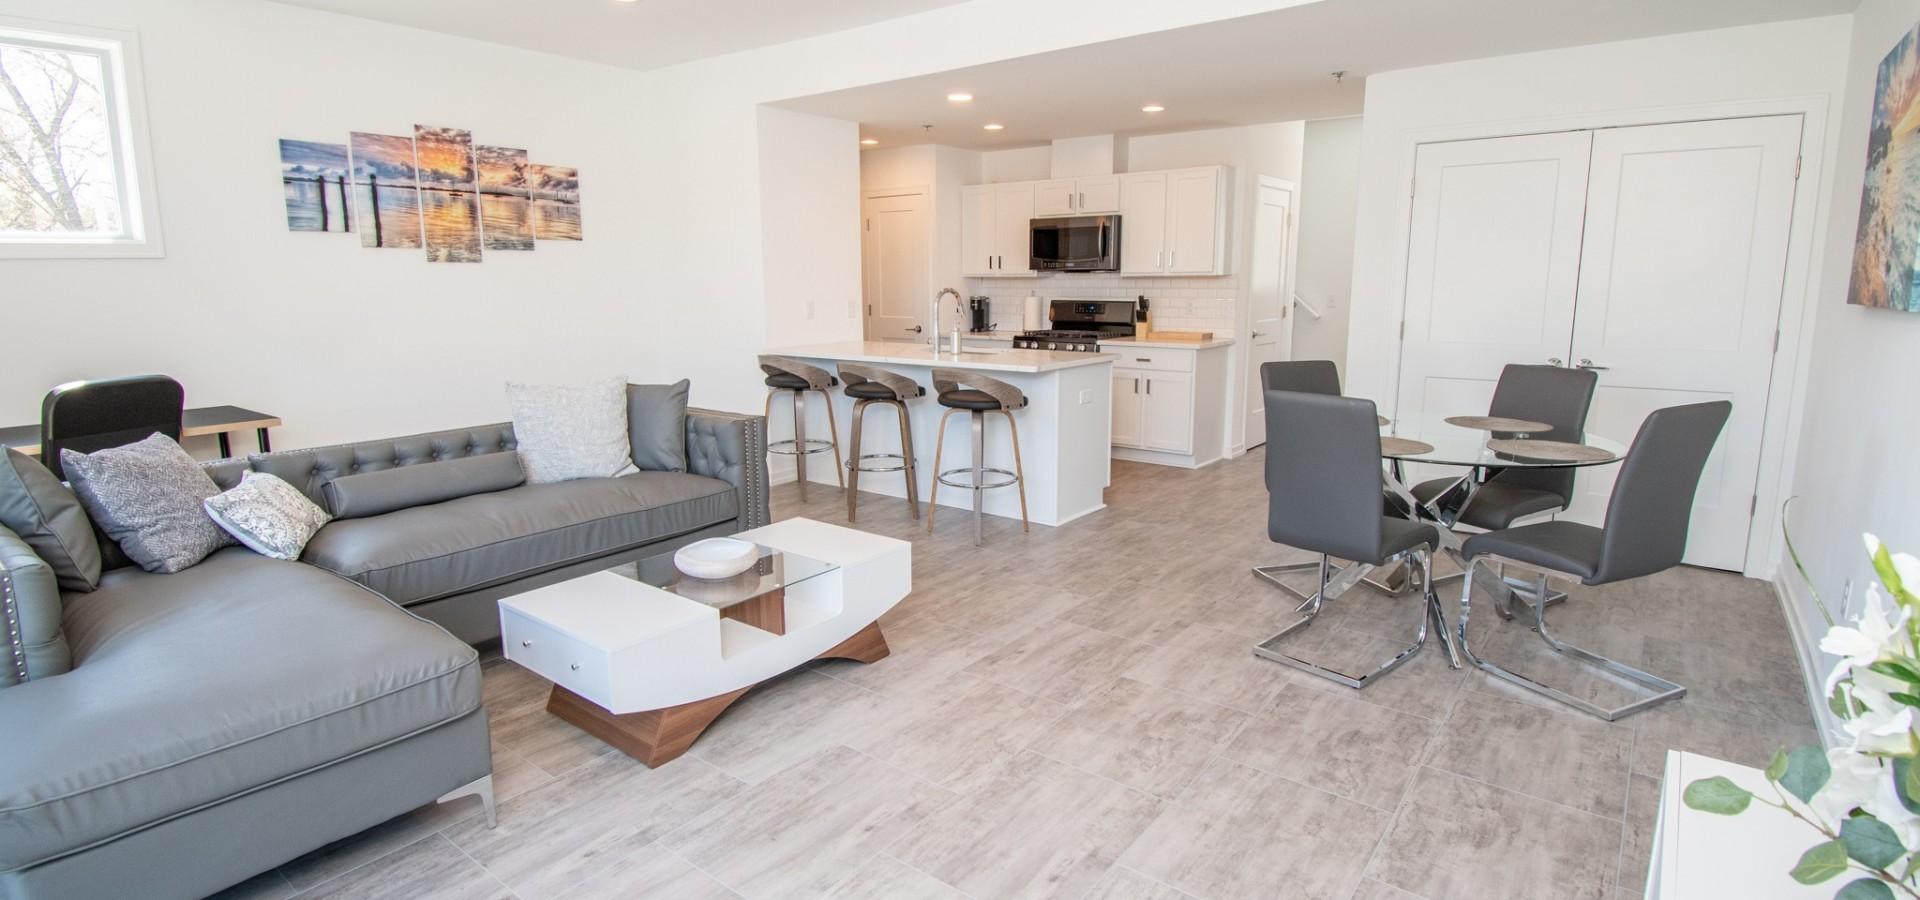 Open Flexible Living Space